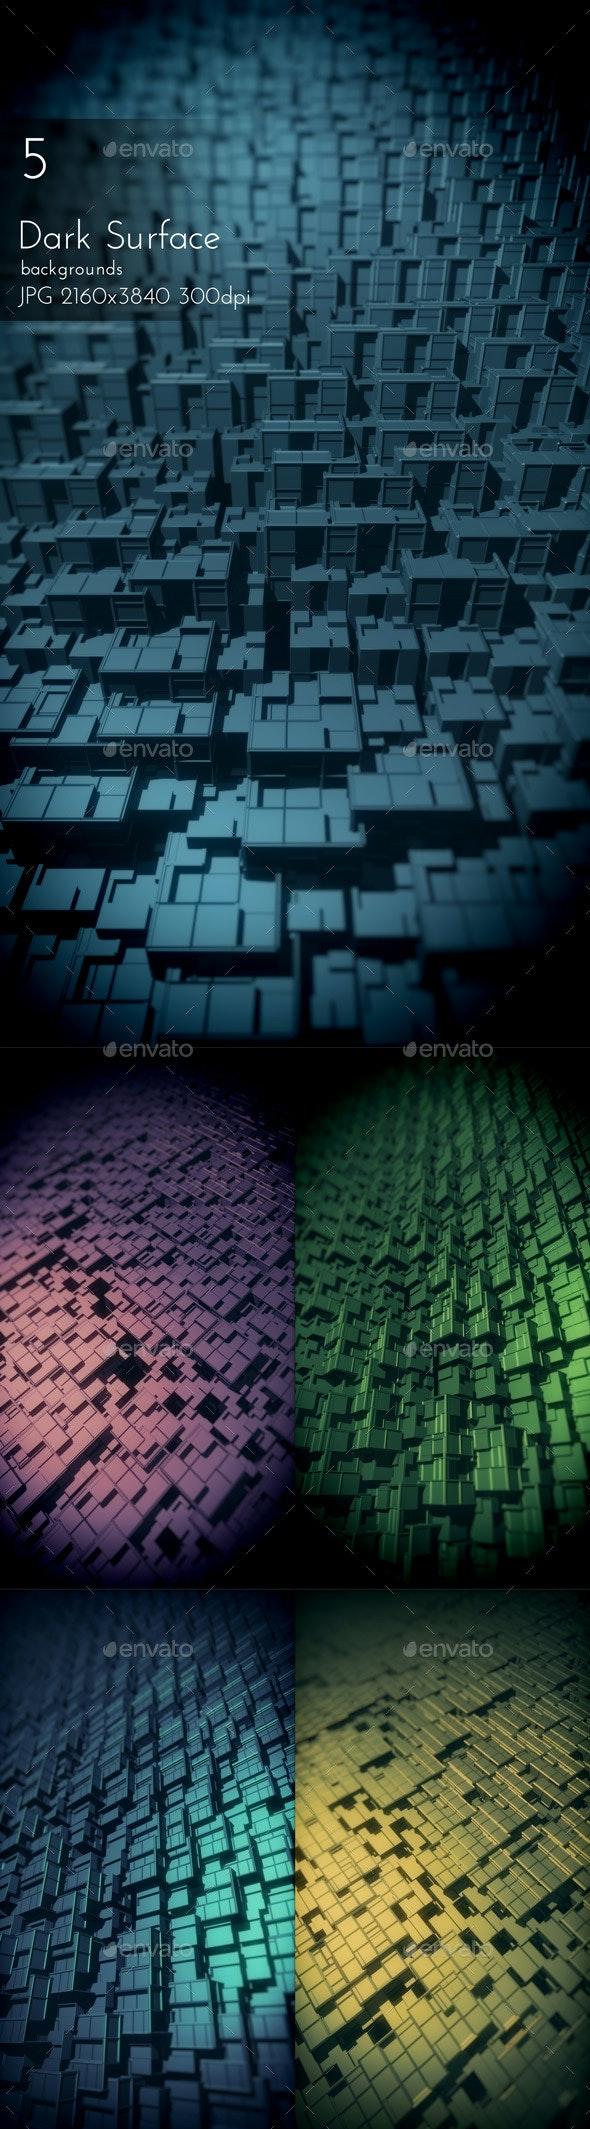 Dark Surface Backgrounds - Tech / Futuristic Backgrounds